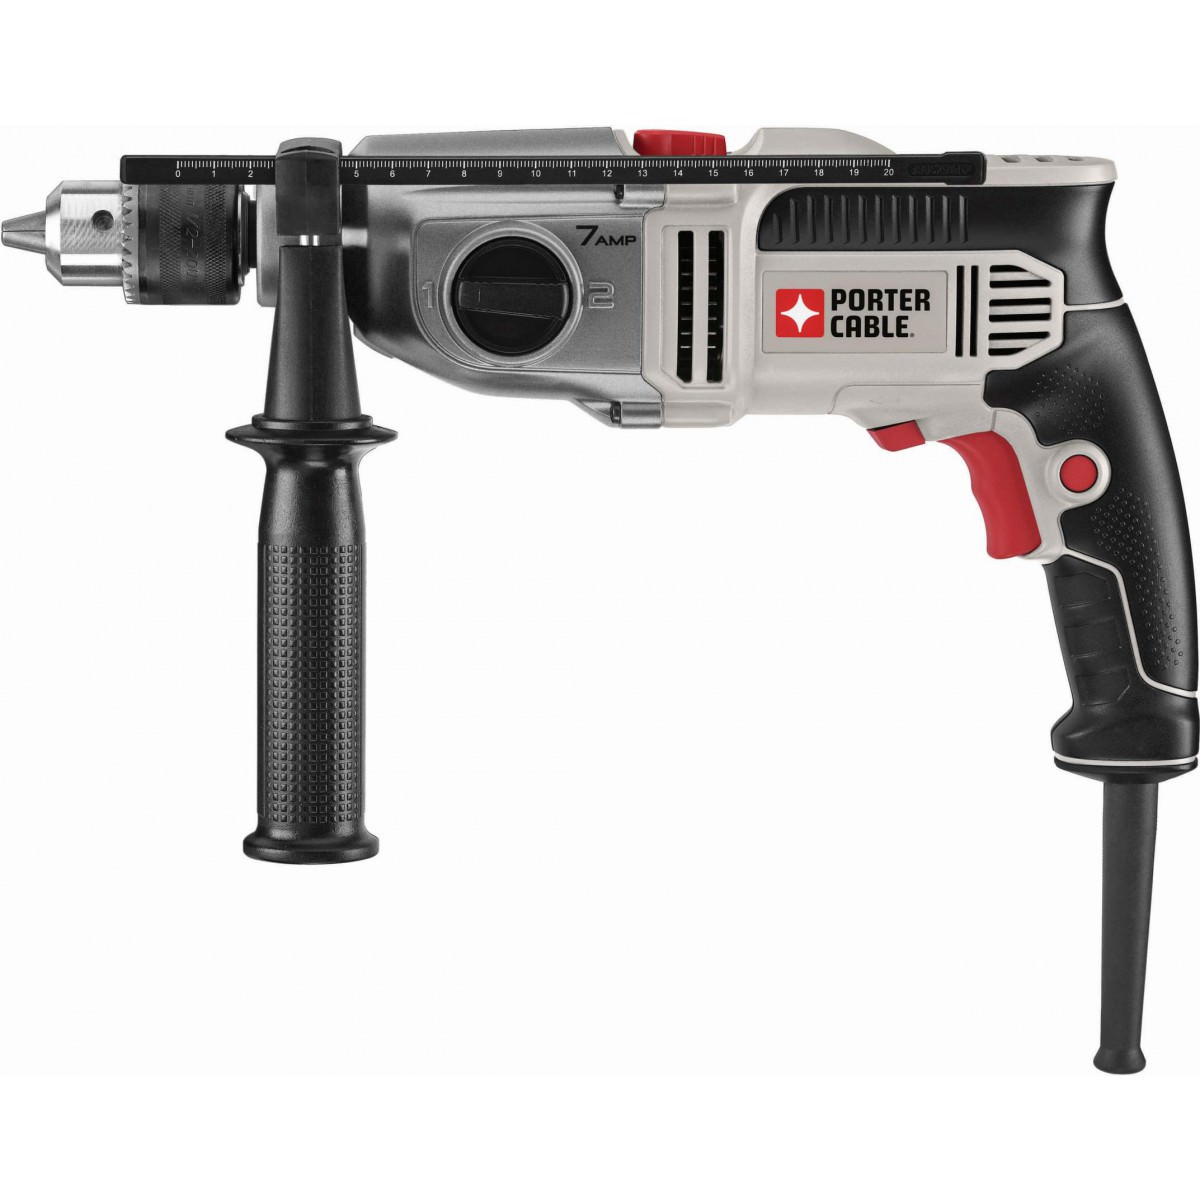 "Porter-Cable 1/2"" VSR 2 Speed Hammer Drill"